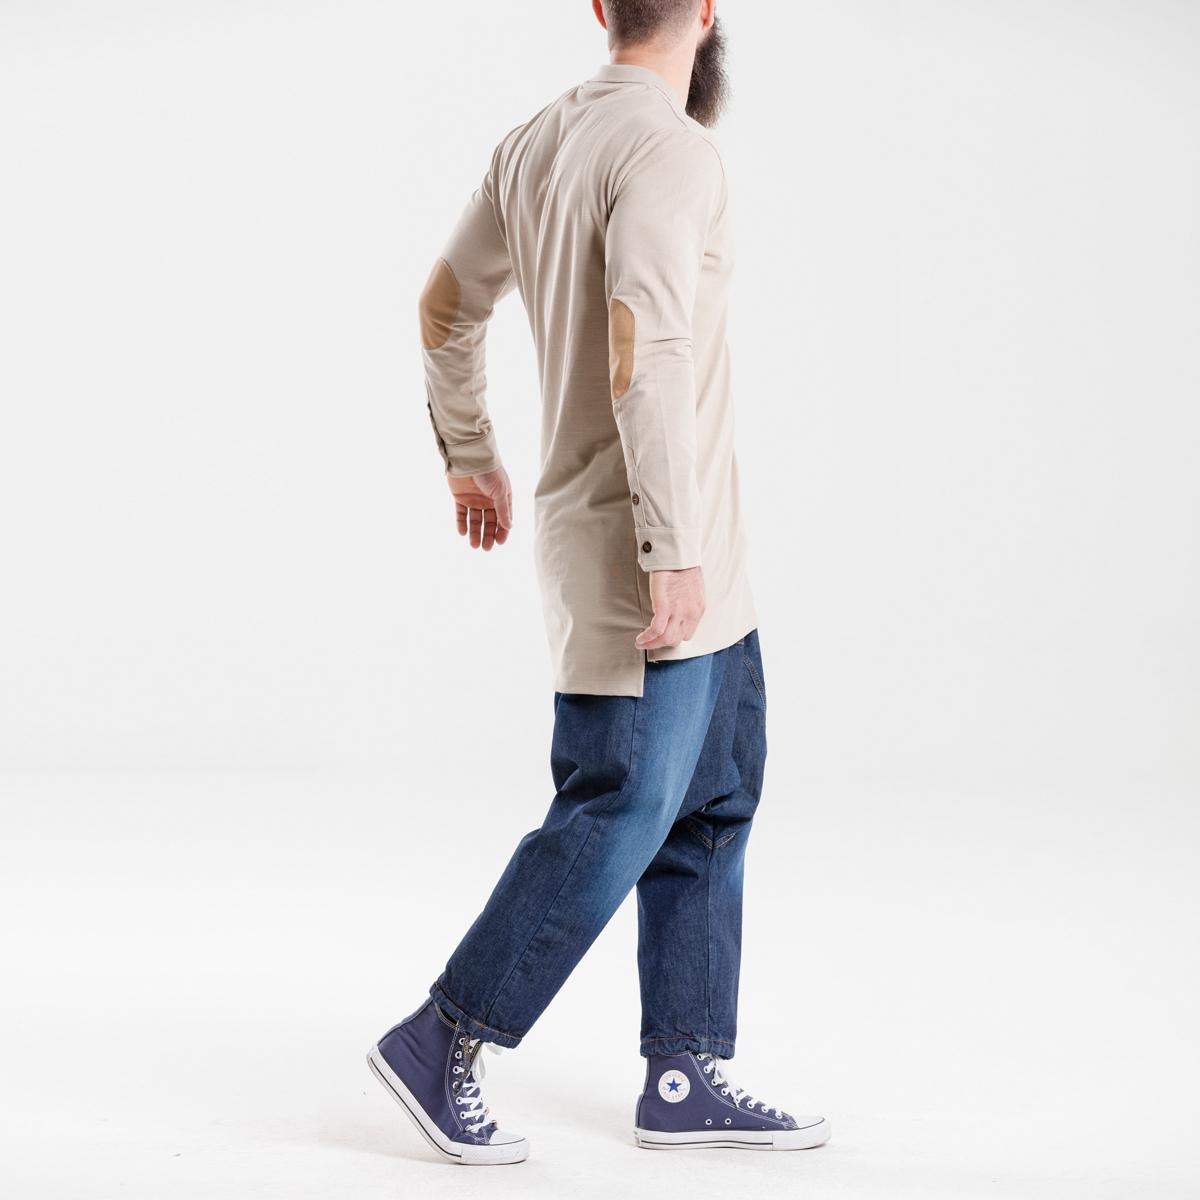 saroual jeans evo blue used dcjeans ensemble profil